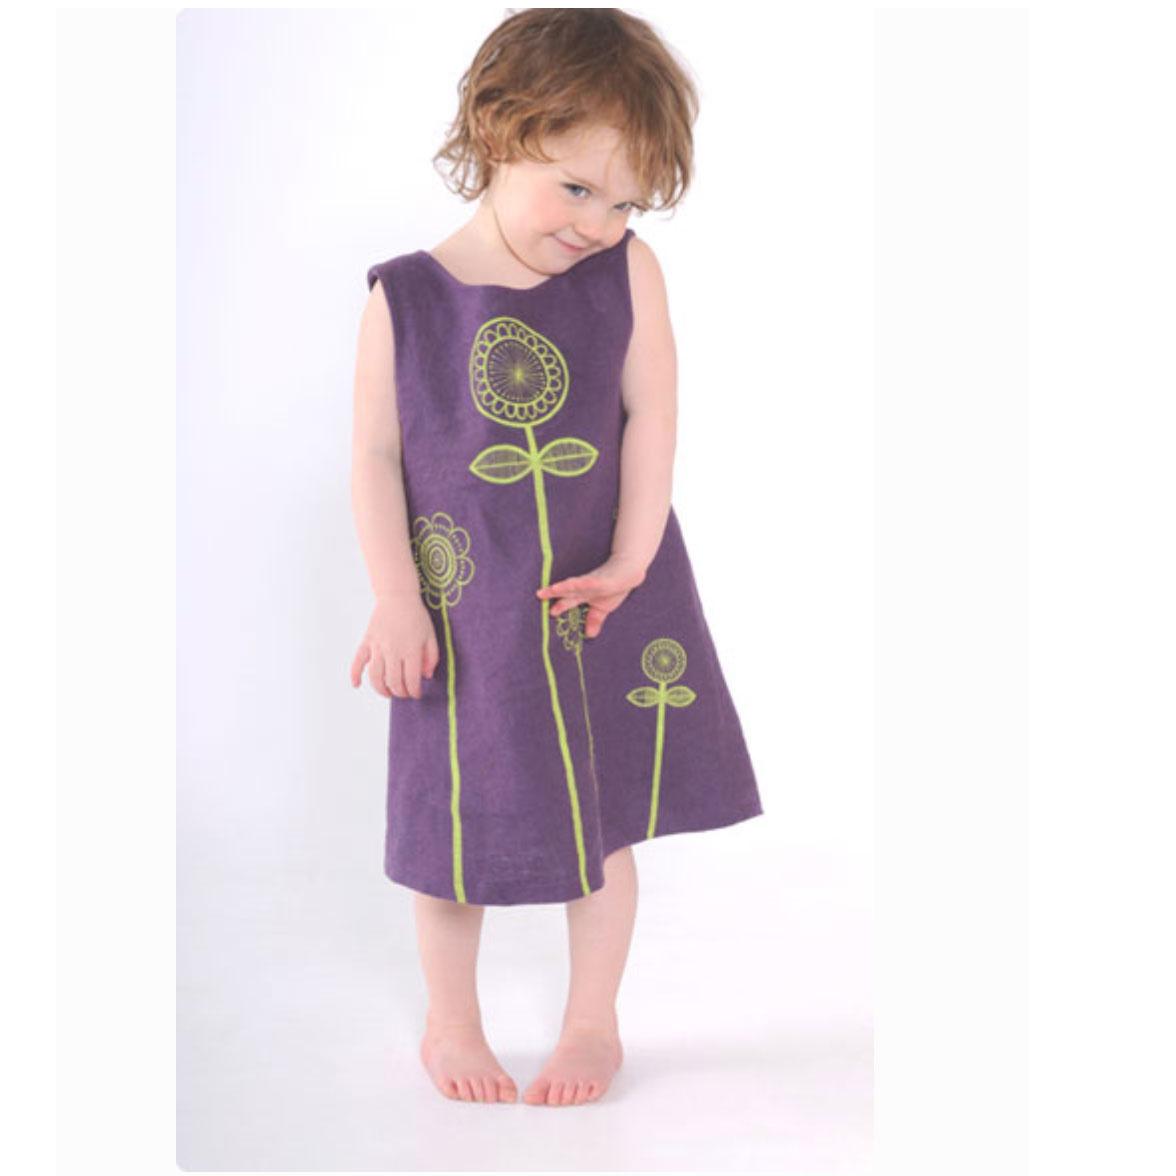 Clothkits DIY jurk Peekaboo Sunflower